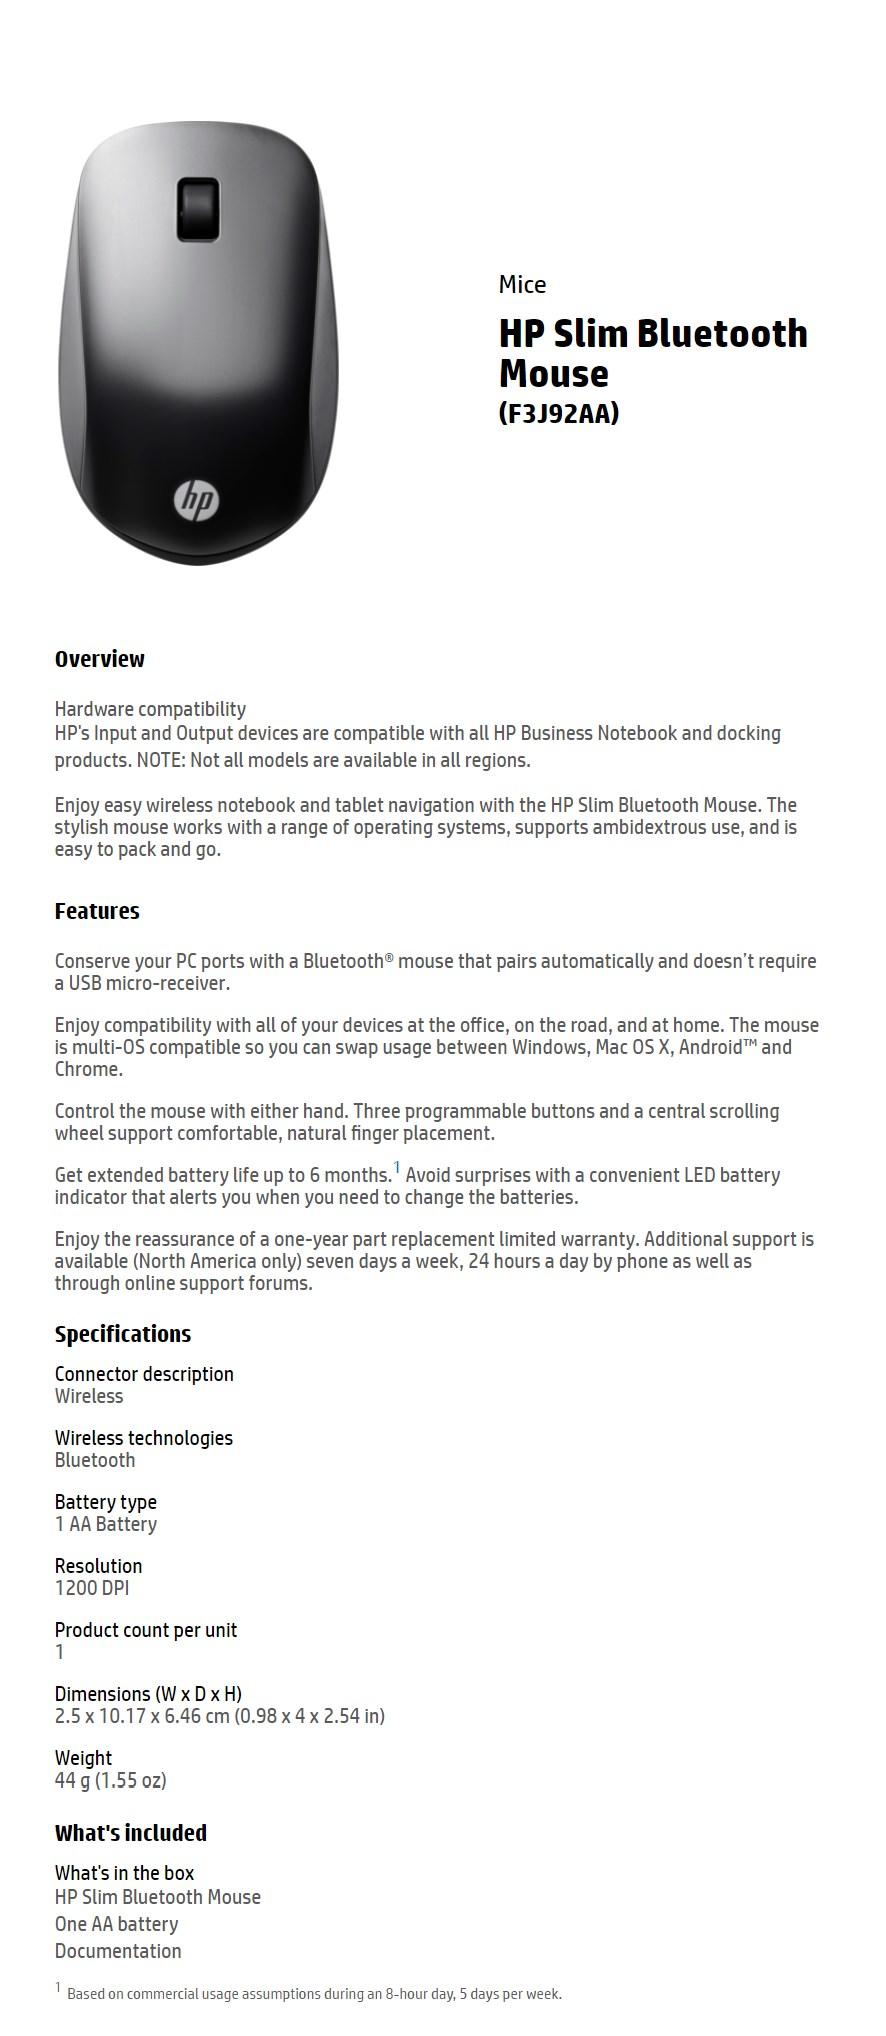 HP Slim Bluetooth Mouse - Desktop Overview 1